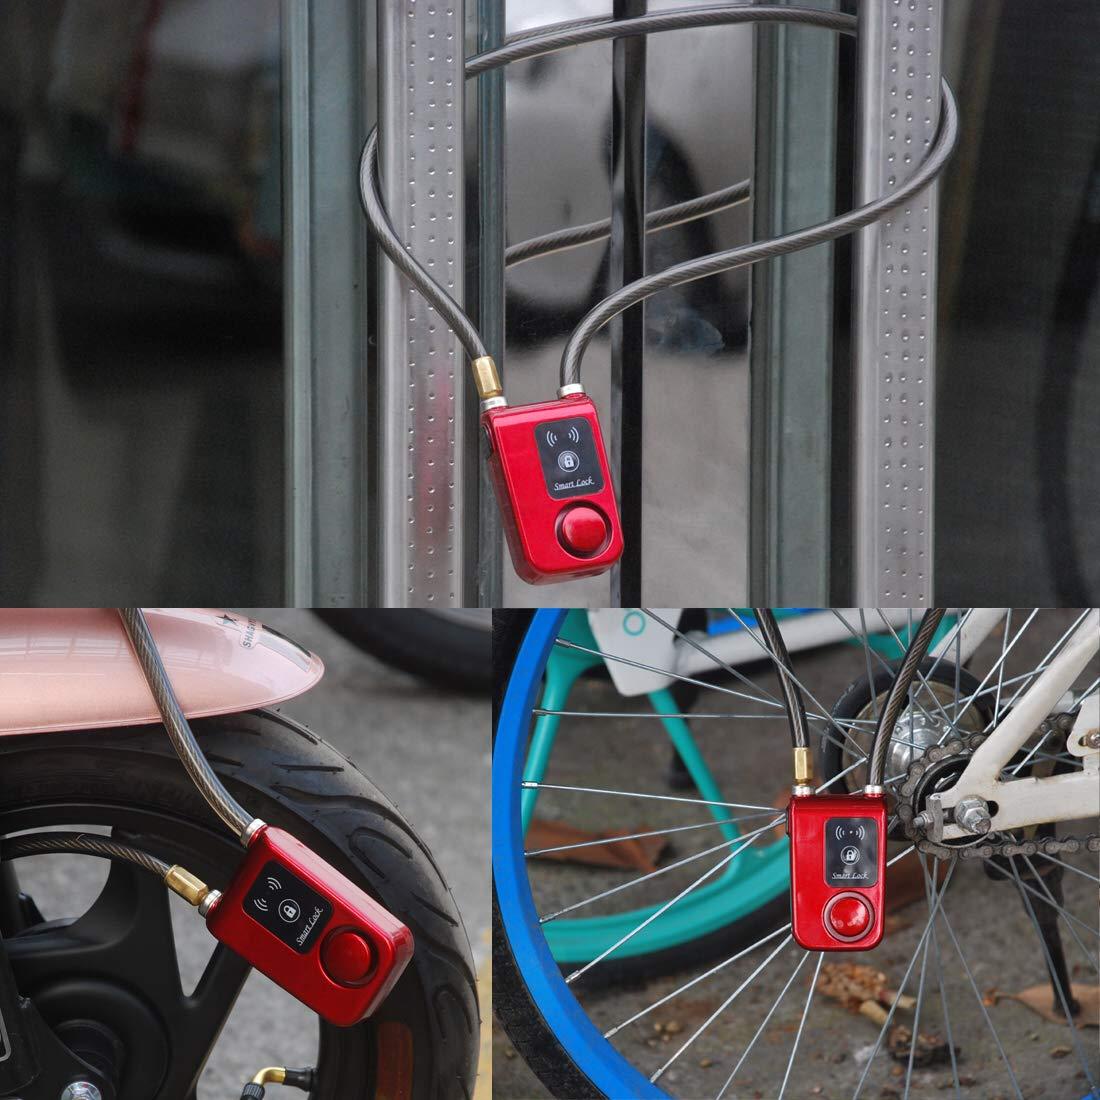 Solebe Bluetooth Smart Lock Keyless Bike//Motorcycle//Gate Door Smart Lock with Anti Theft Alarm 110dB Phone APP Control